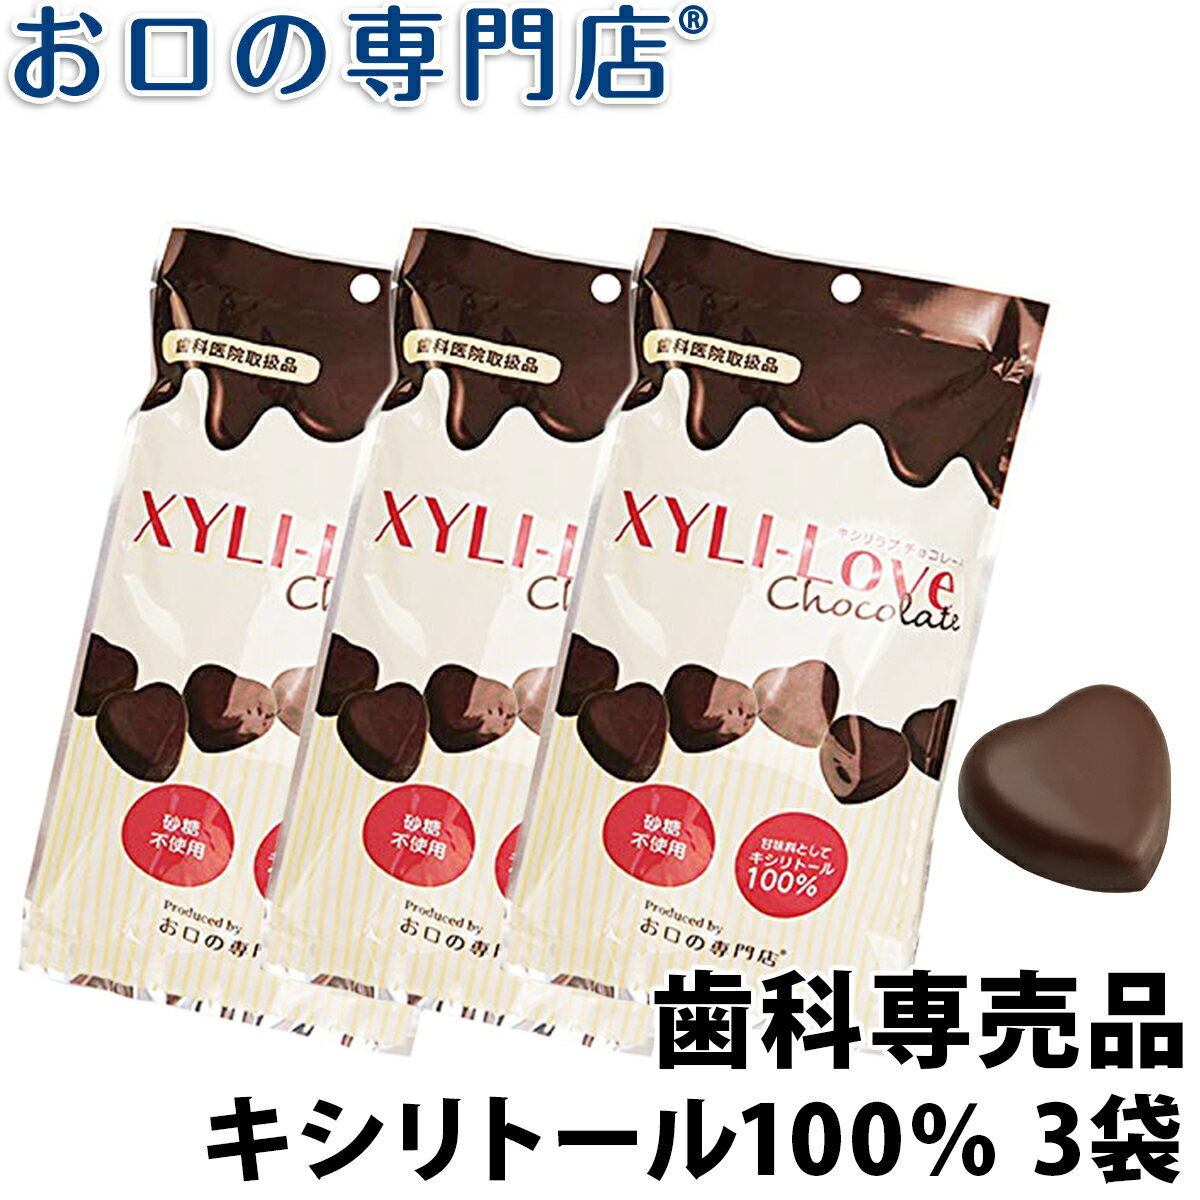 XYLI-LOVE(キシリラブ) チョコレート 24粒(72g) × 3袋  歯科専売品 【ゆうパケット(メール便)送料無料】